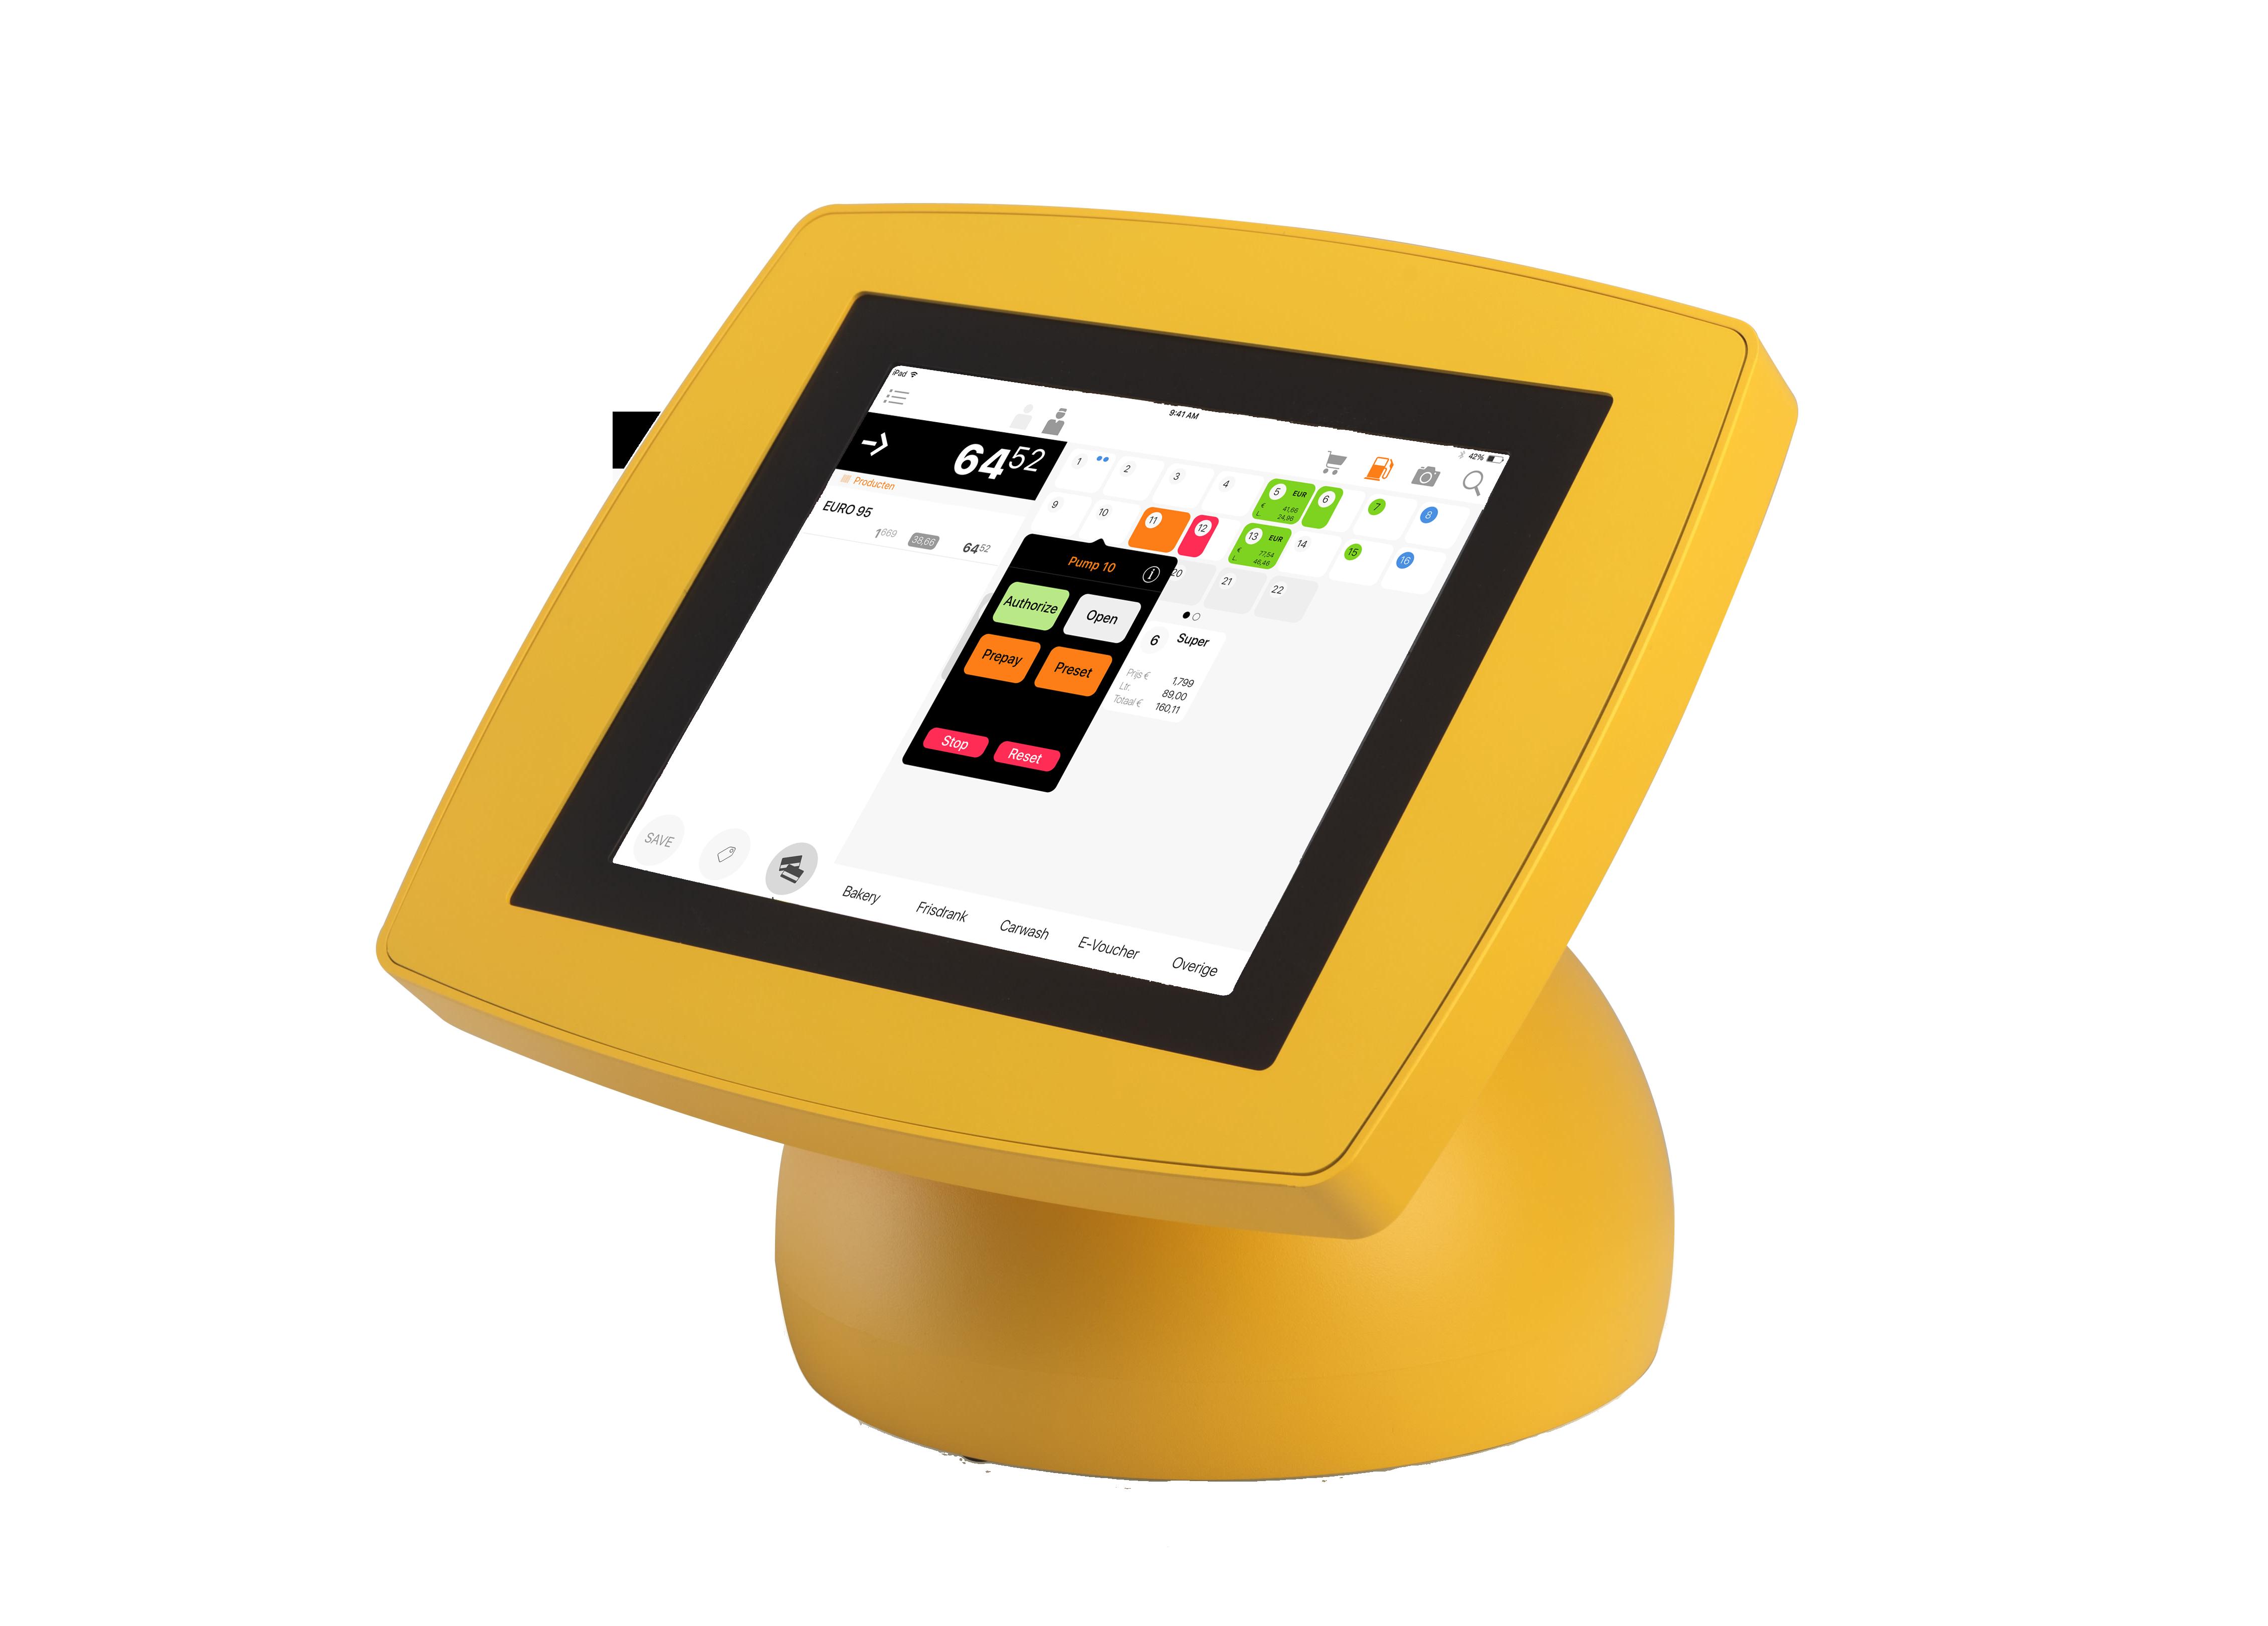 iPad kassa voor petrol in gele houder